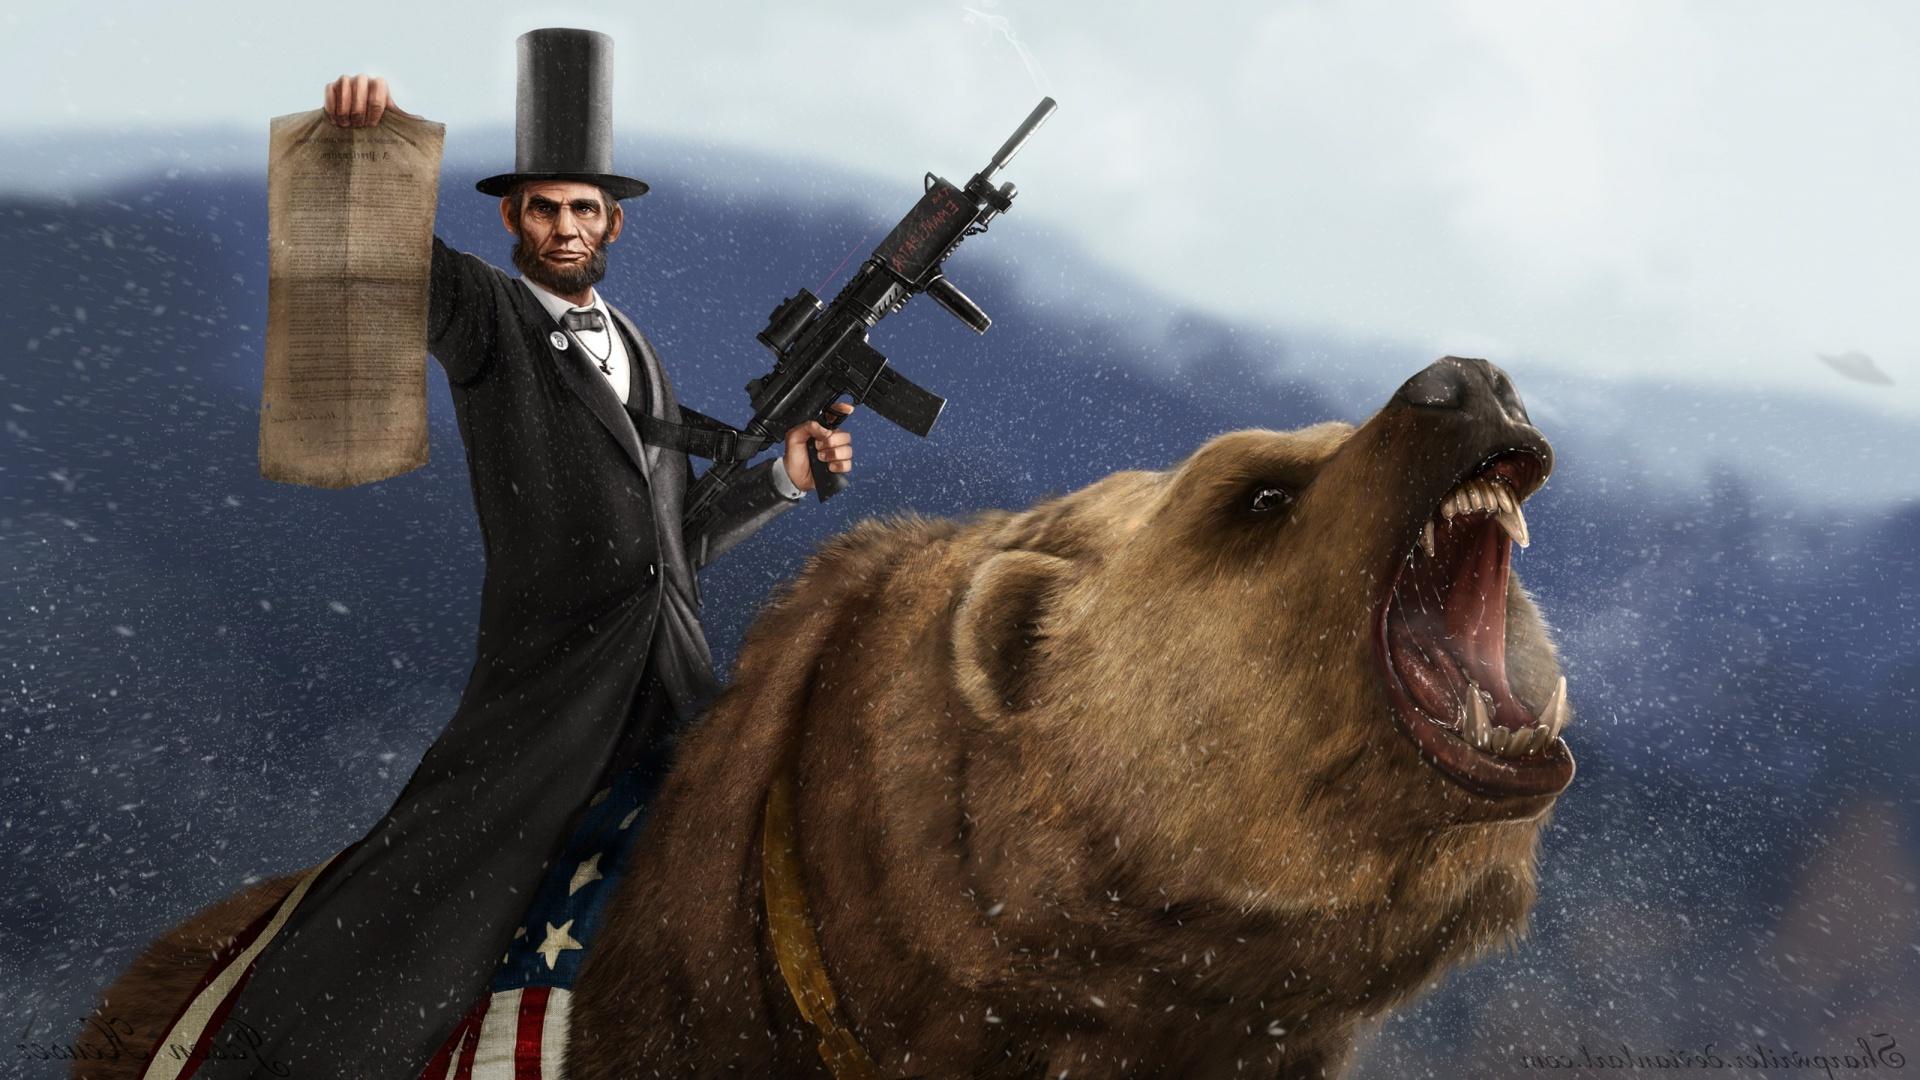 Abraham Lincoln Wallpaper Bear 1 1920x1080